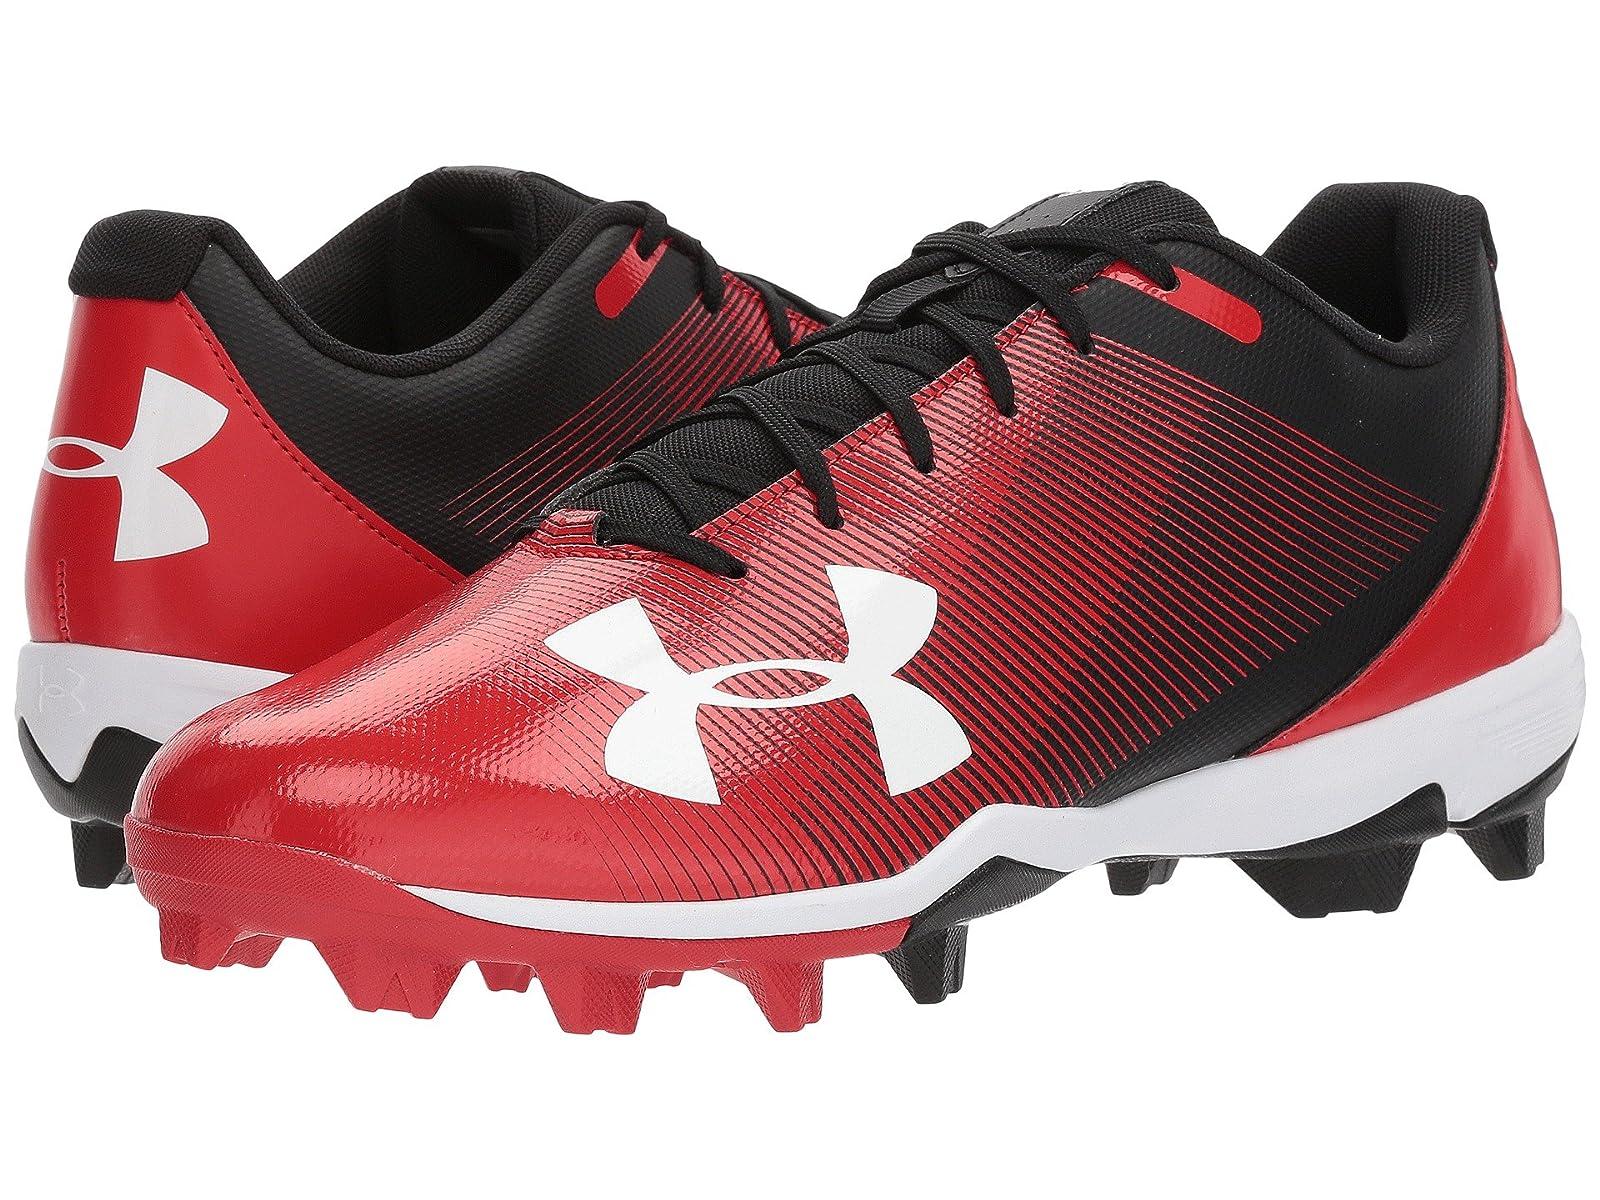 Under Armour UA Leadoff Low RMAtmospheric grades have affordable shoes